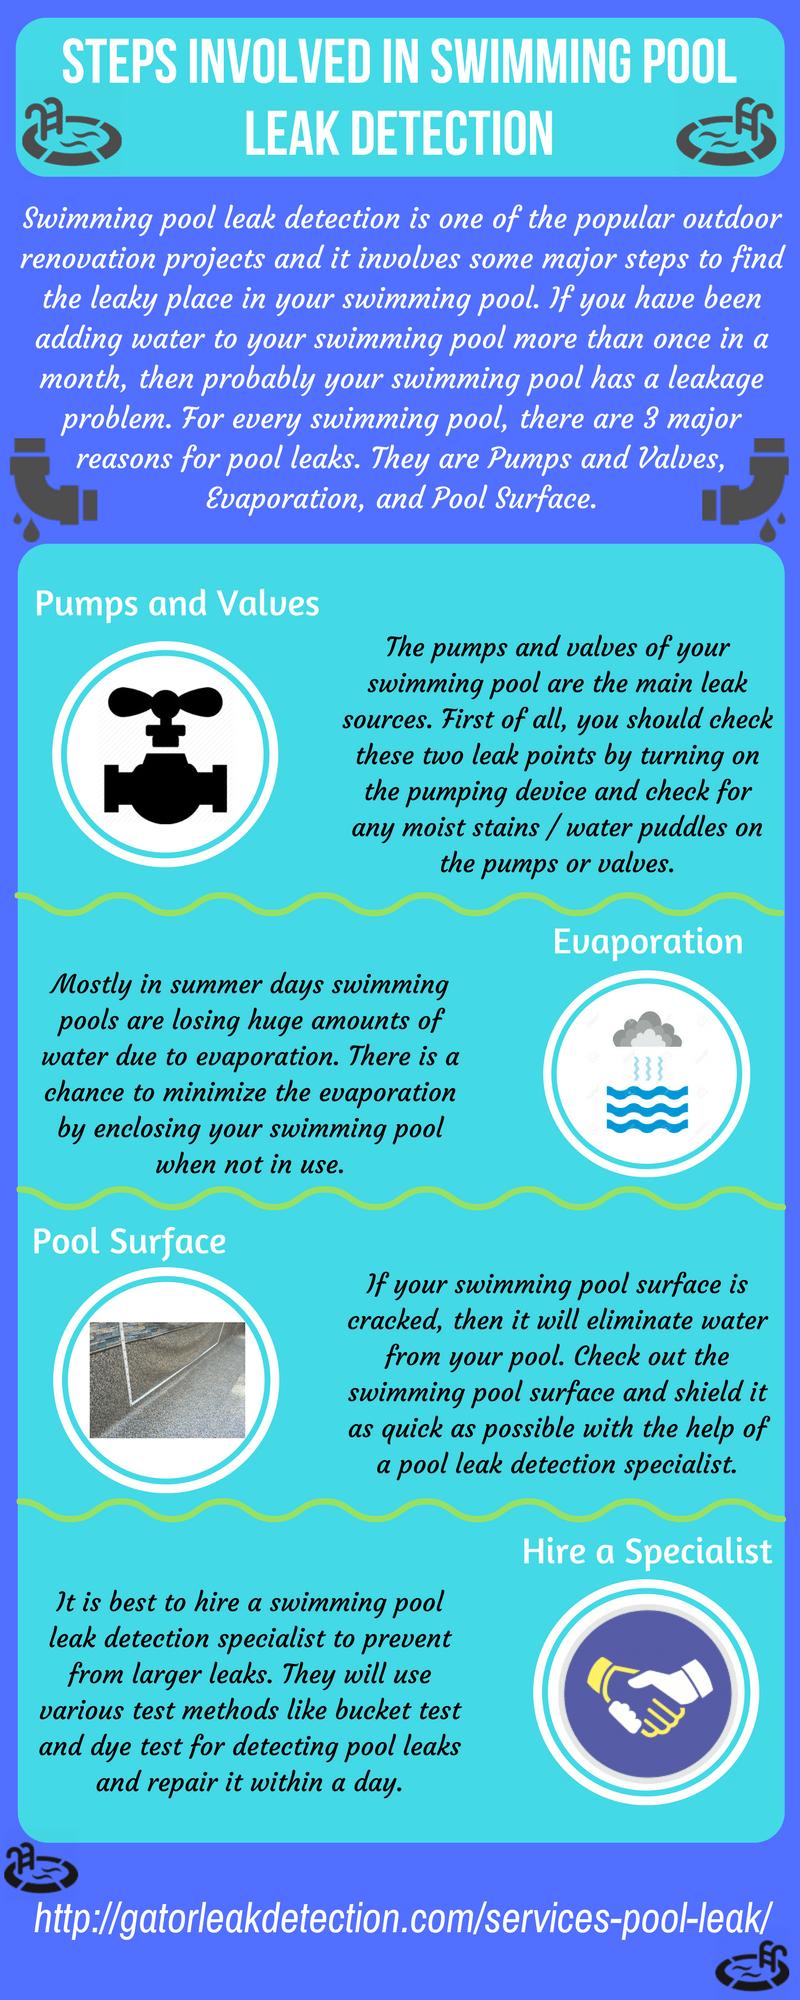 Steps involved in Swimming Pool Leak Detection